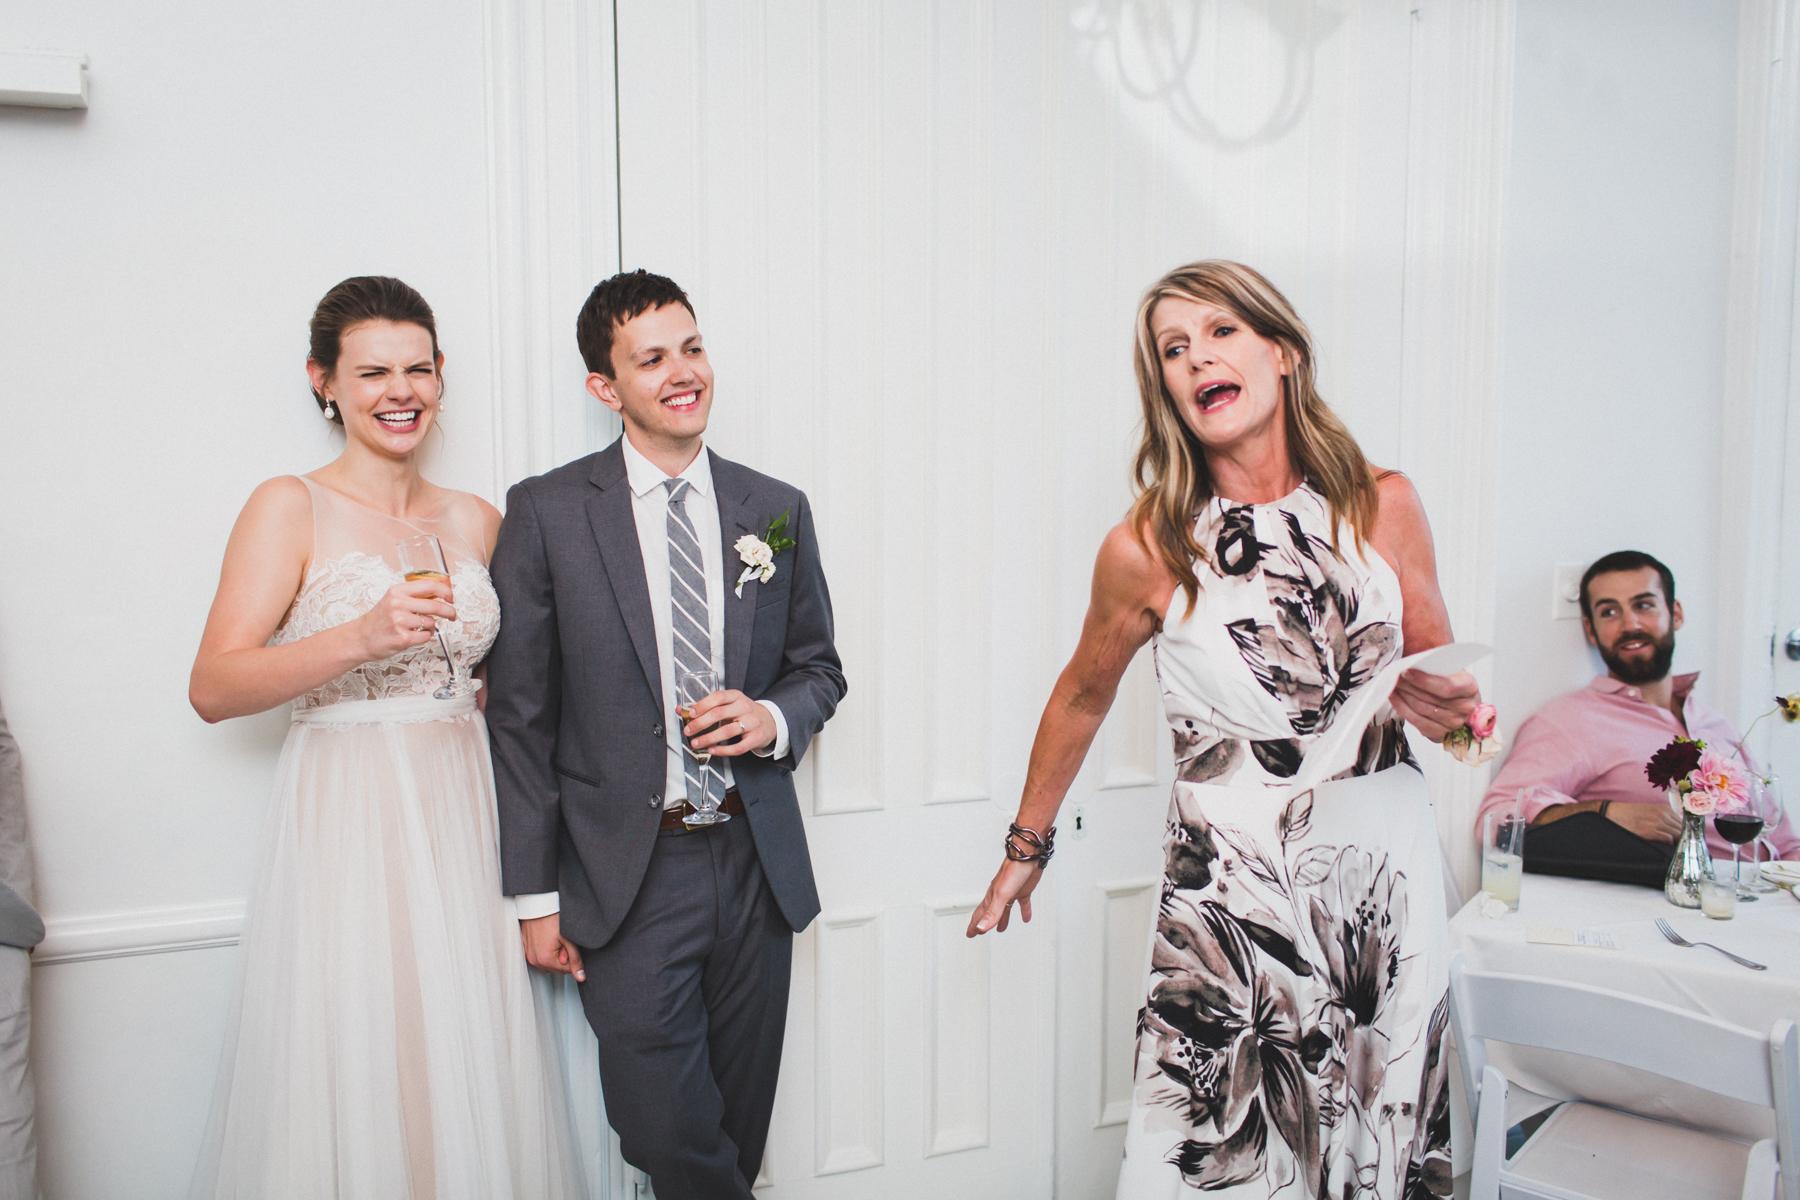 ICI-Restaurant-Fort-Greene-Brooklyn-Intimate-Documentary-Wedding-Photography-Elvira-Kalviste-82.jpg